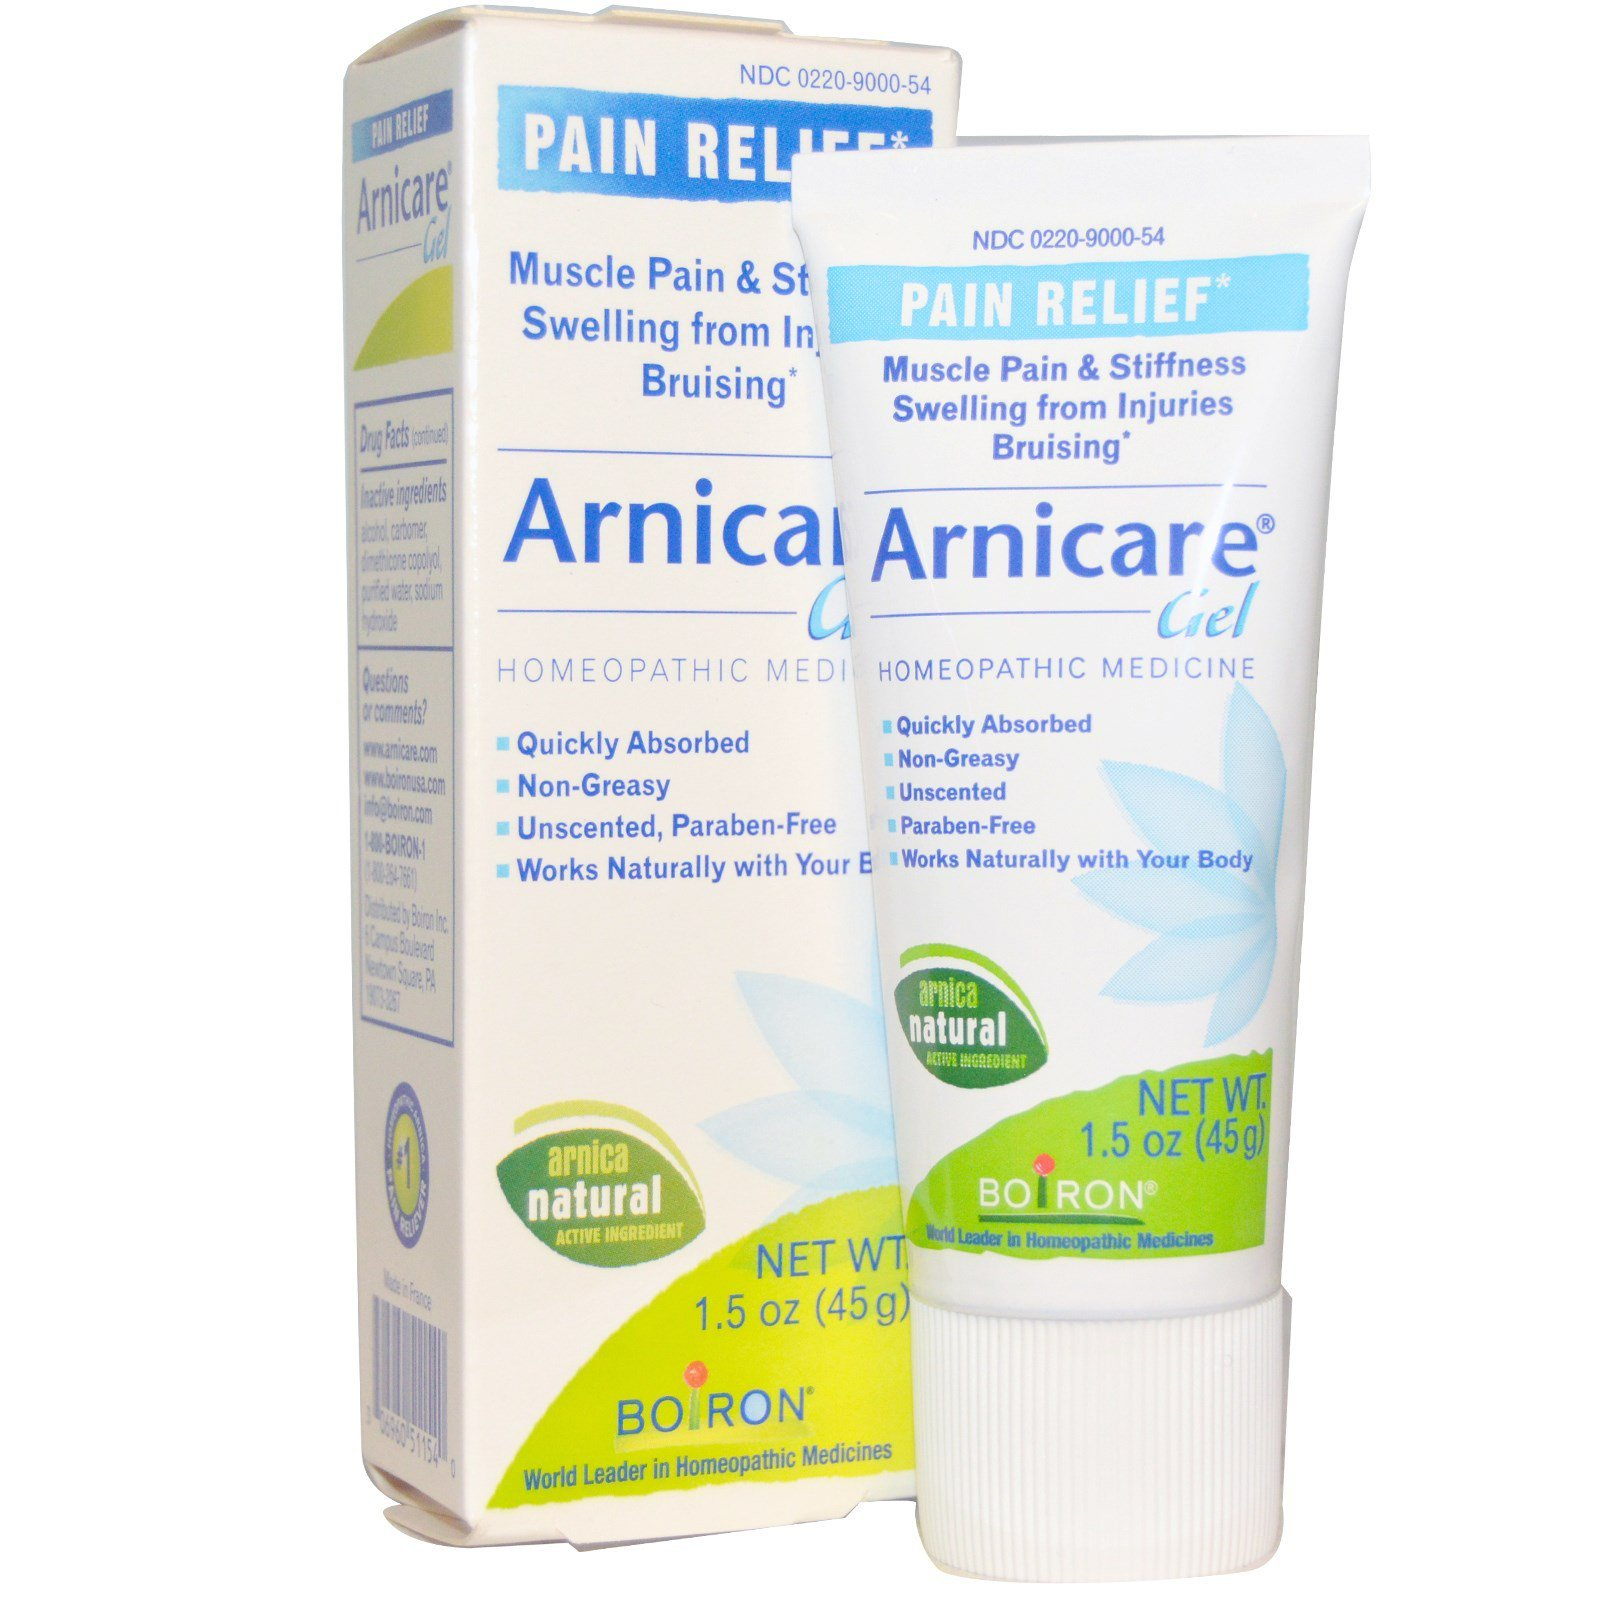 Boiron Arnica Gel Homeopathic Medicine 1.50 oz